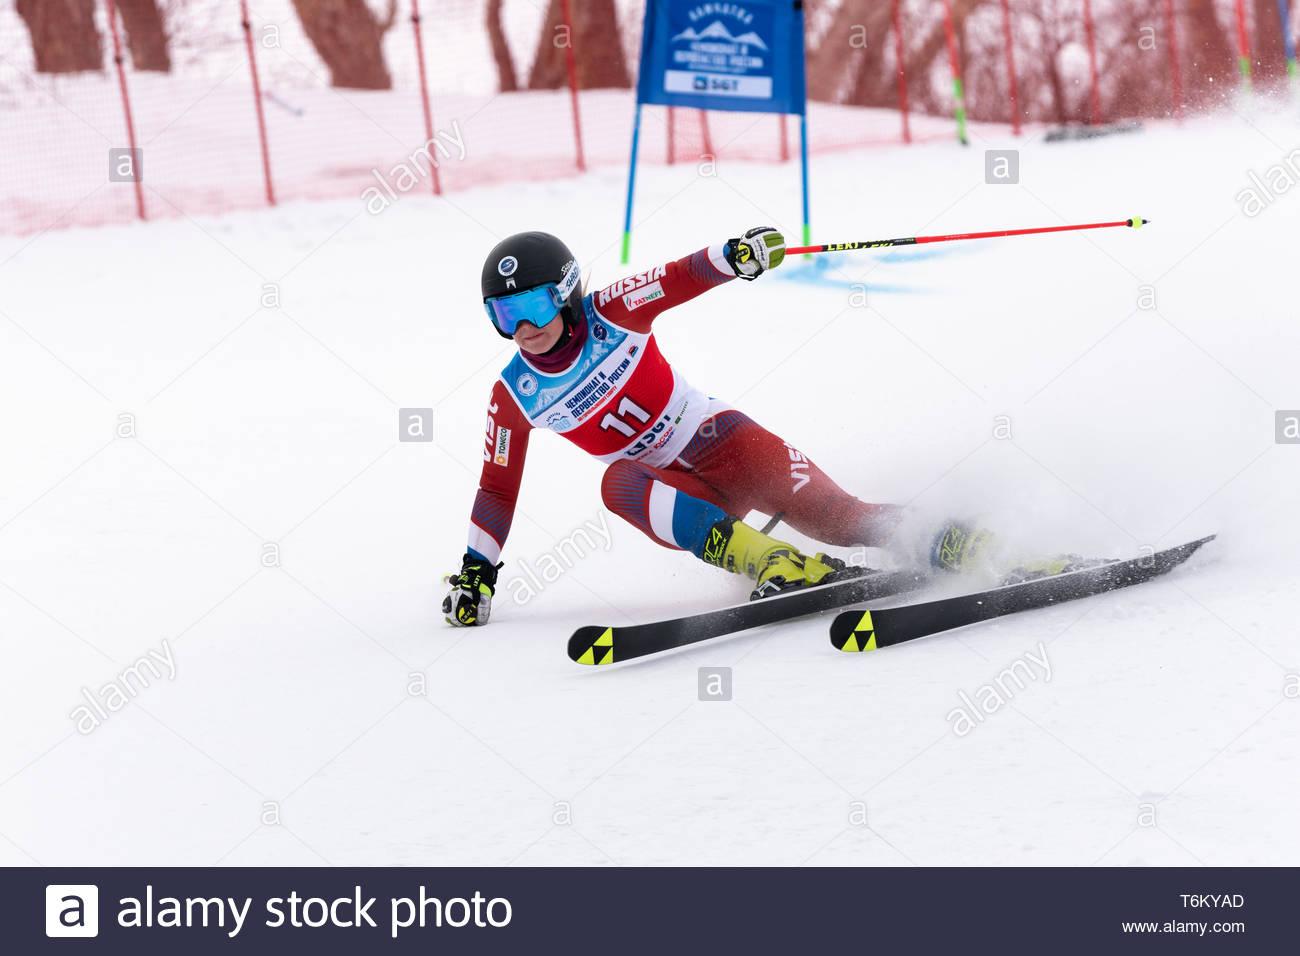 KAMCHATKA PENINSULA, RUSSIA - APRIL 2, 2019: Mountain skier Sofya Krokhina (Moscow) skiing down mount slope. Russian Women's Alpine Skiing Cup, Intern - Stock Image